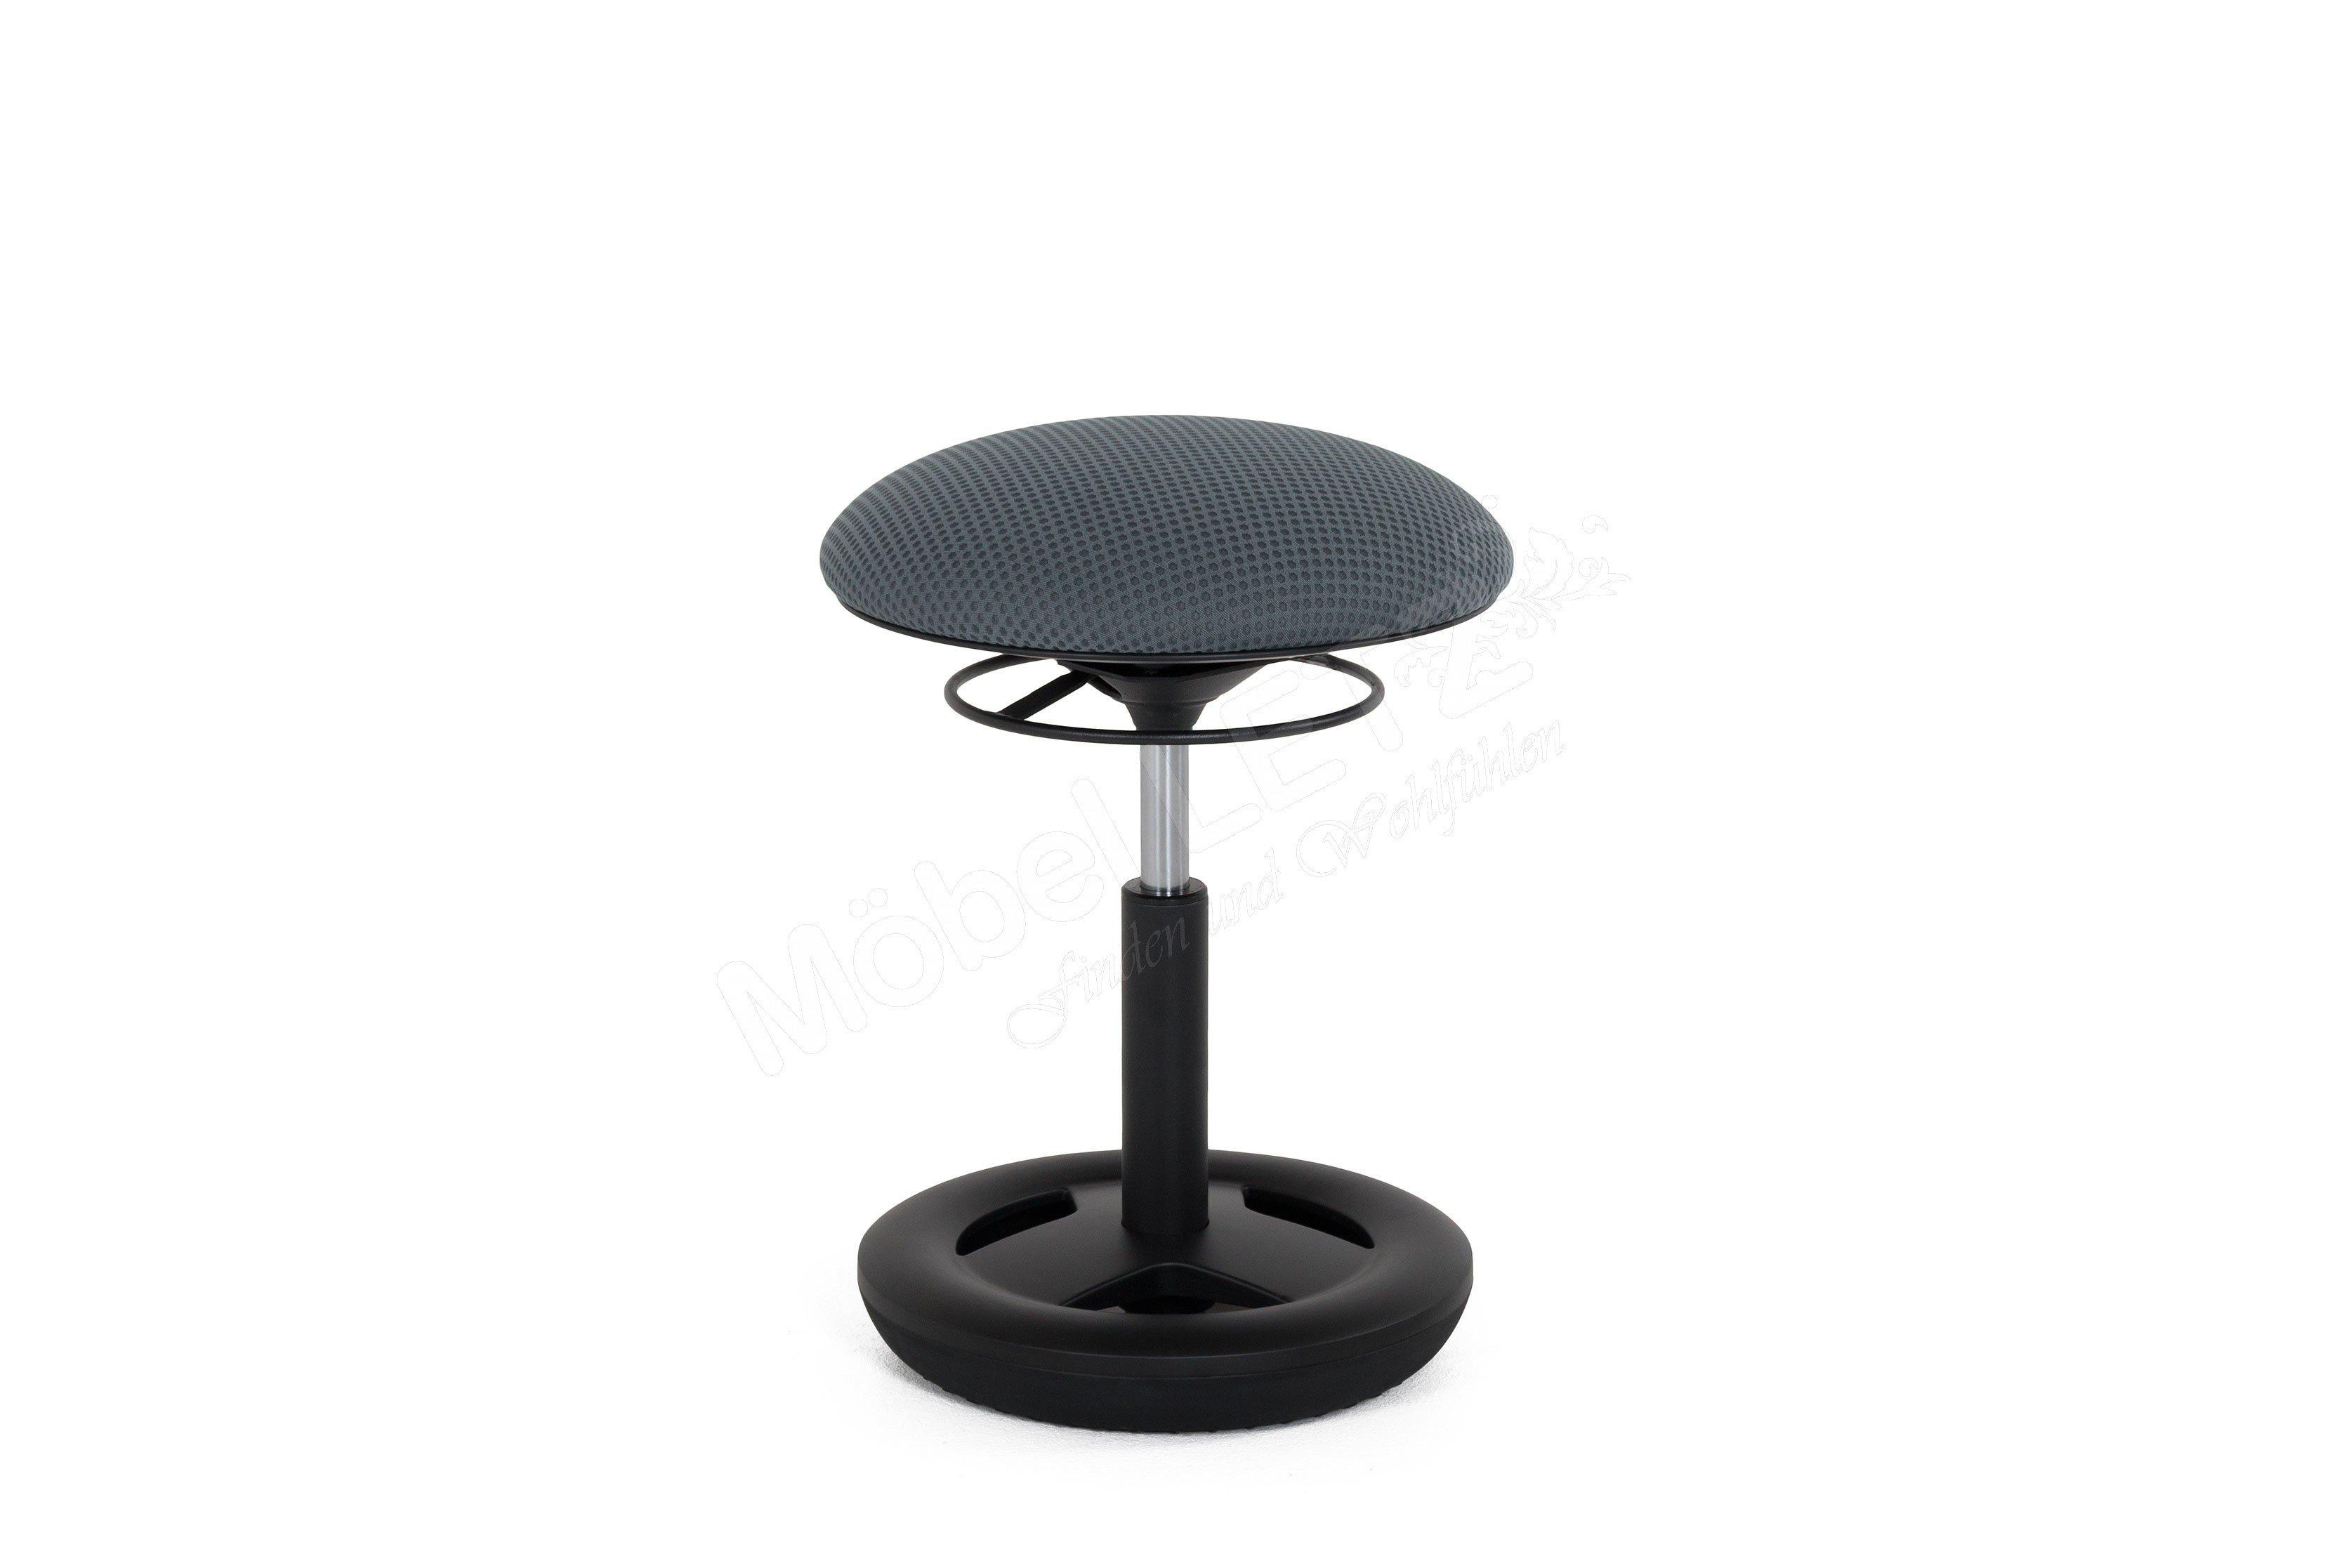 Topstar Fitness-Hocker Sitness Creativ 900 grau/ schwarz | Möbel ...